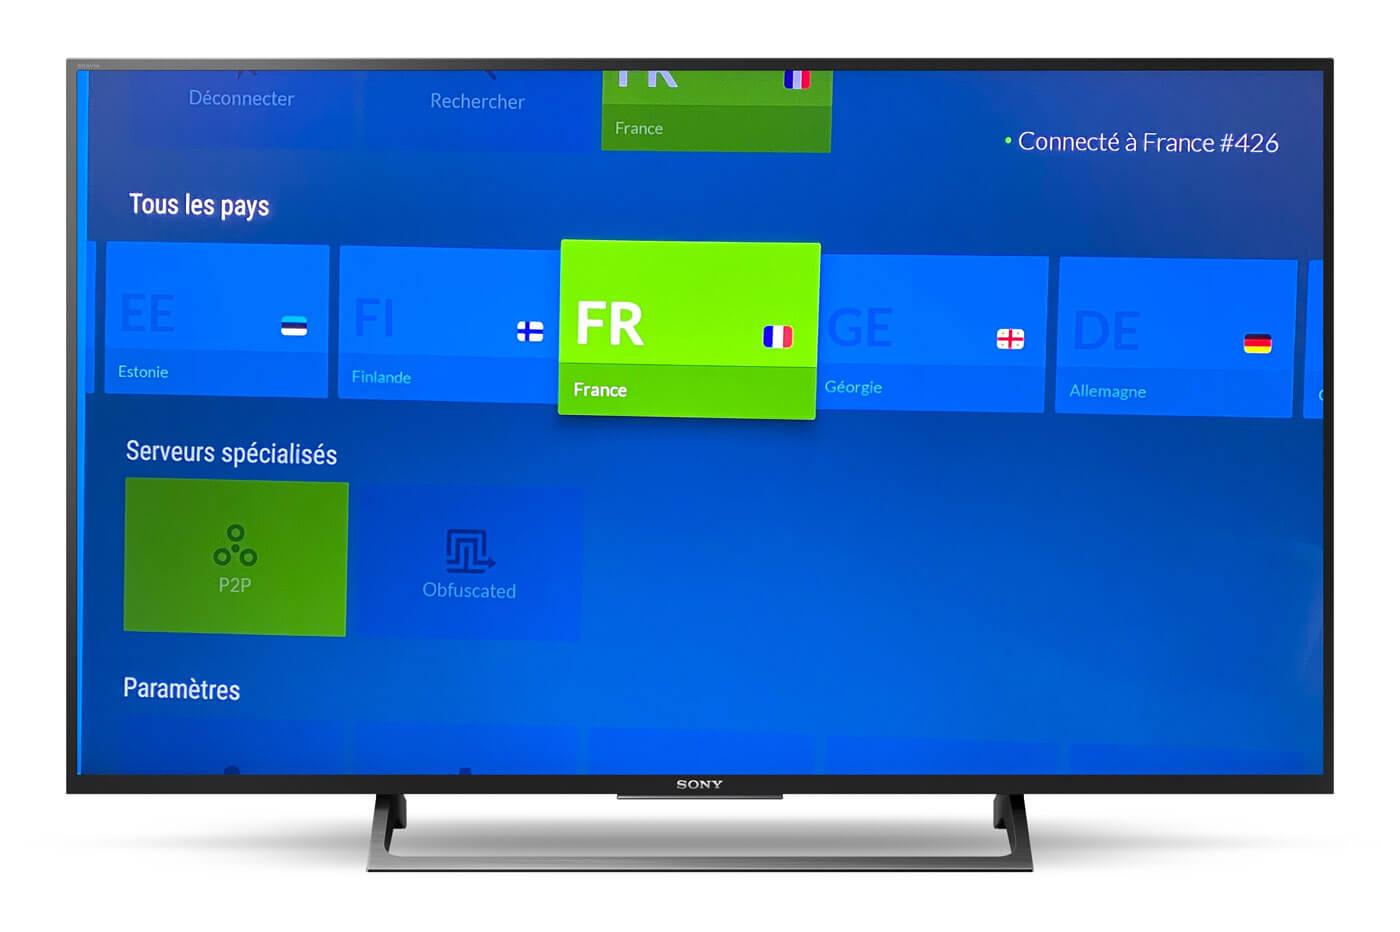 NordVPN Smart TV